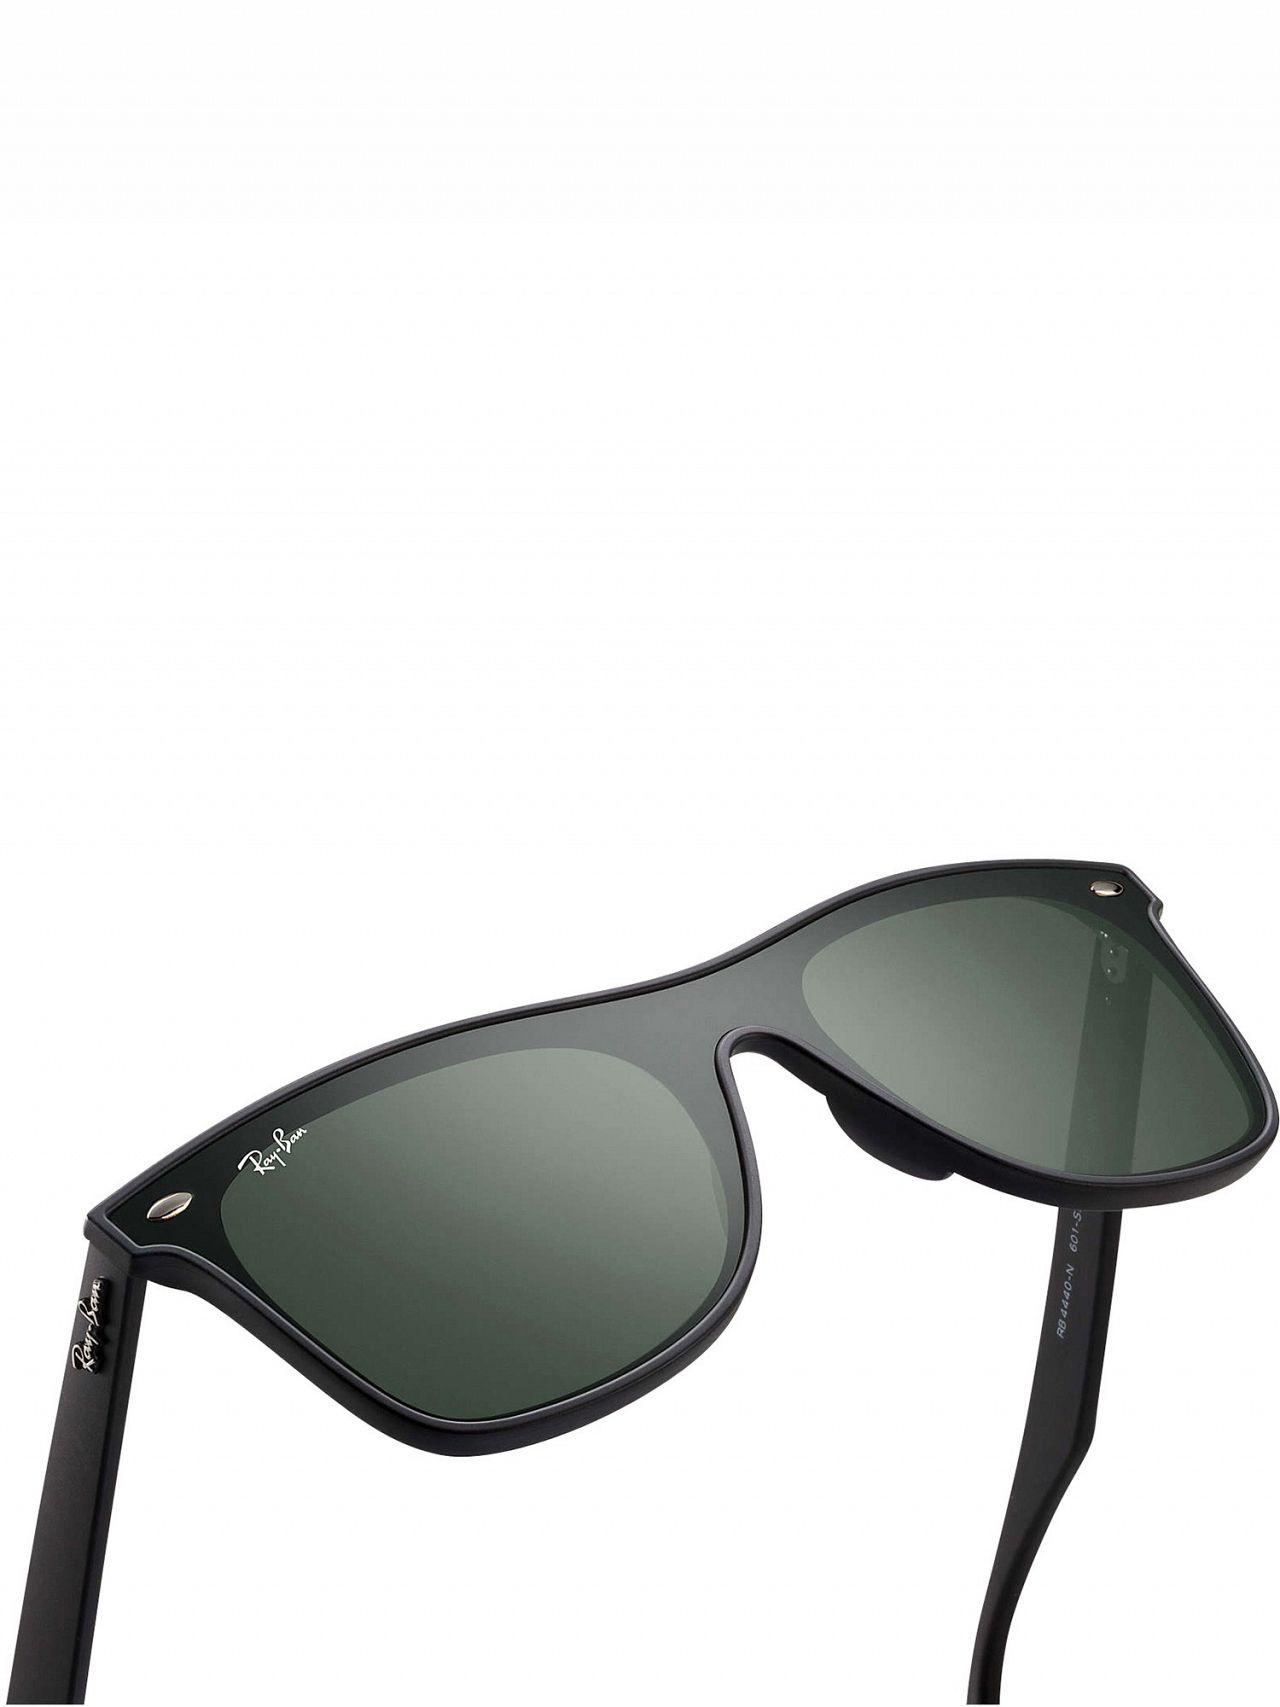 666b998b293 Ray-Ban Black RB4440N Blaze Wayfarer Sunglasses